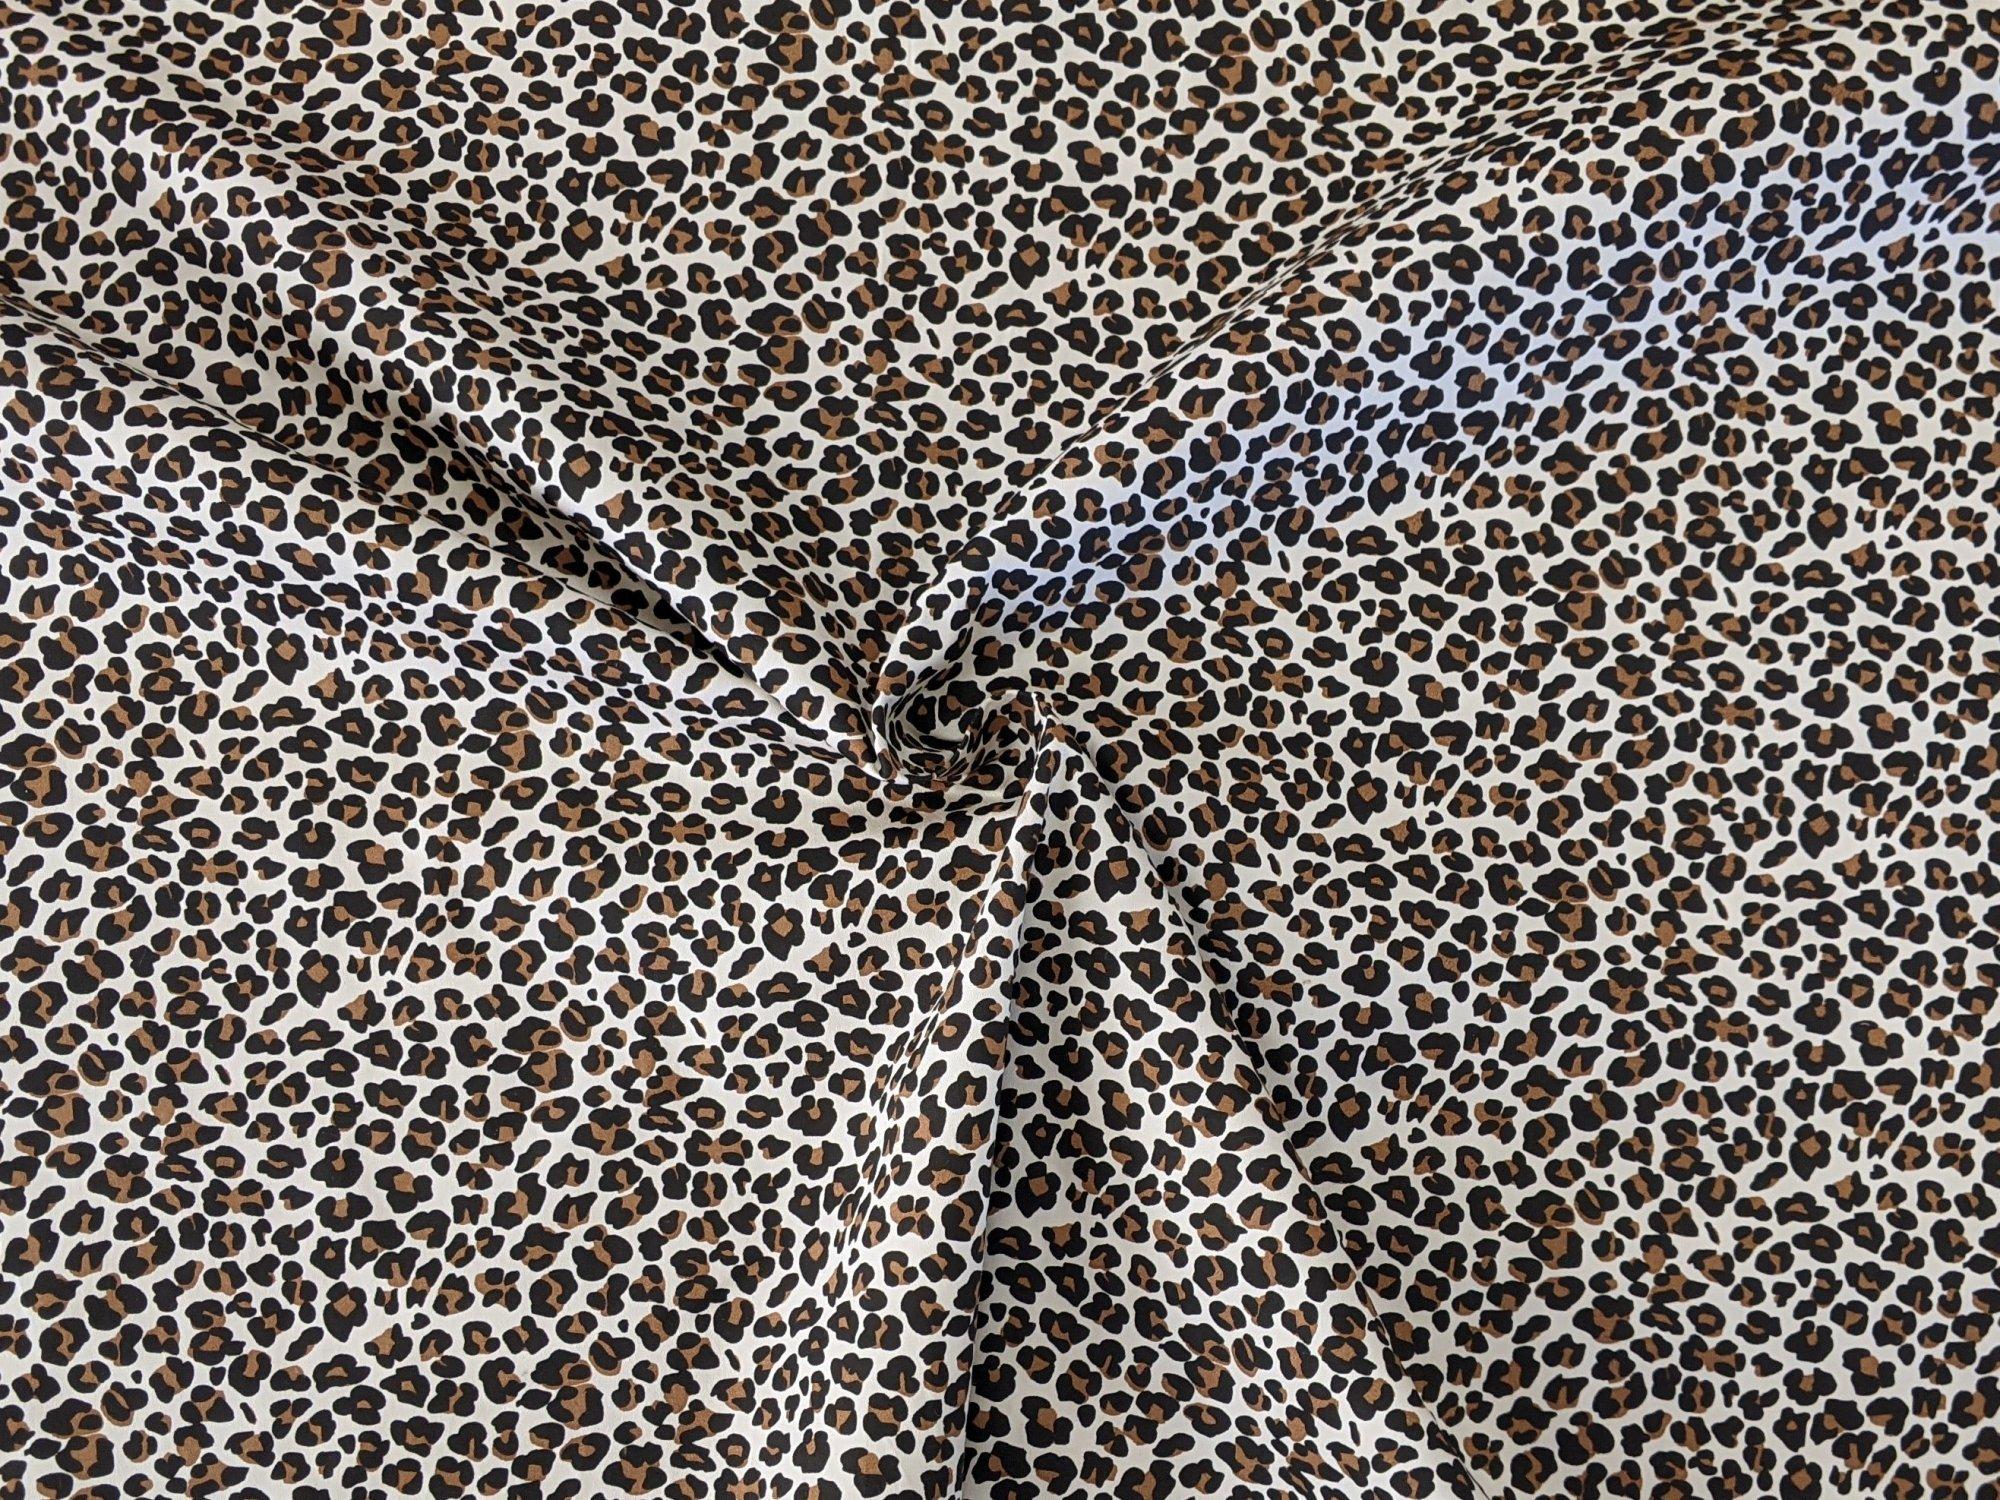 Leopard Print Stretch Sateen Cotton Lycra